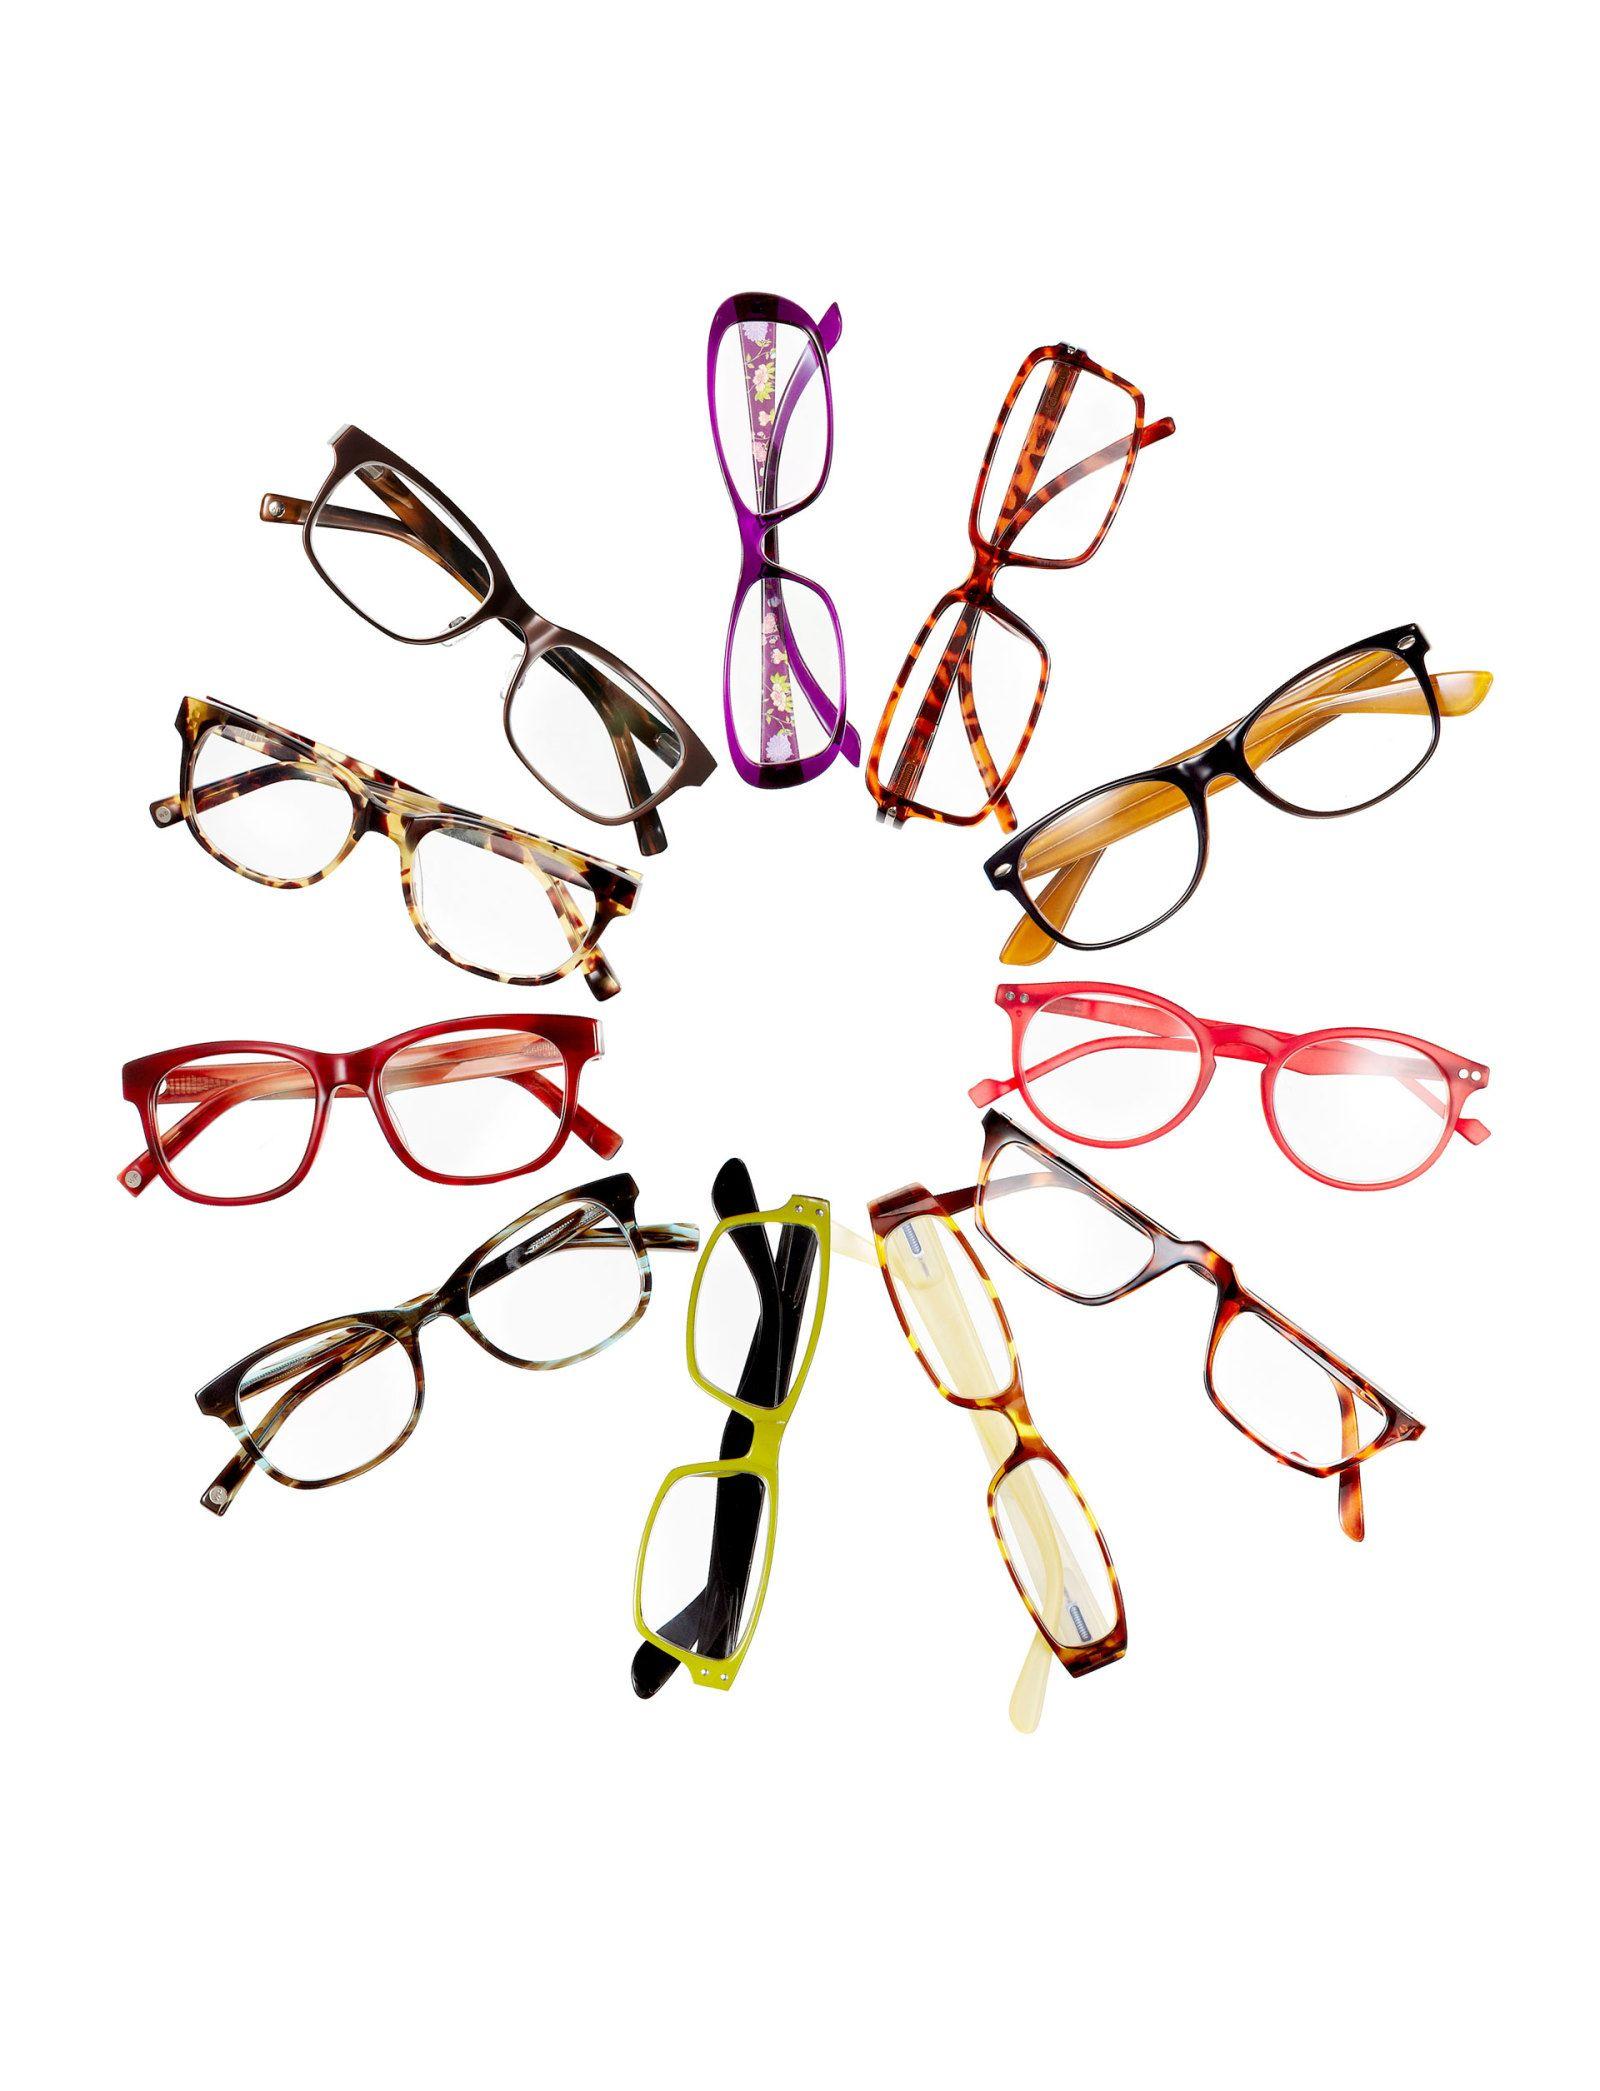 c83747cb3c Buying Eyeglasses Online  A Close Look at Eyewear Websites -  GoodHousekeeping.com